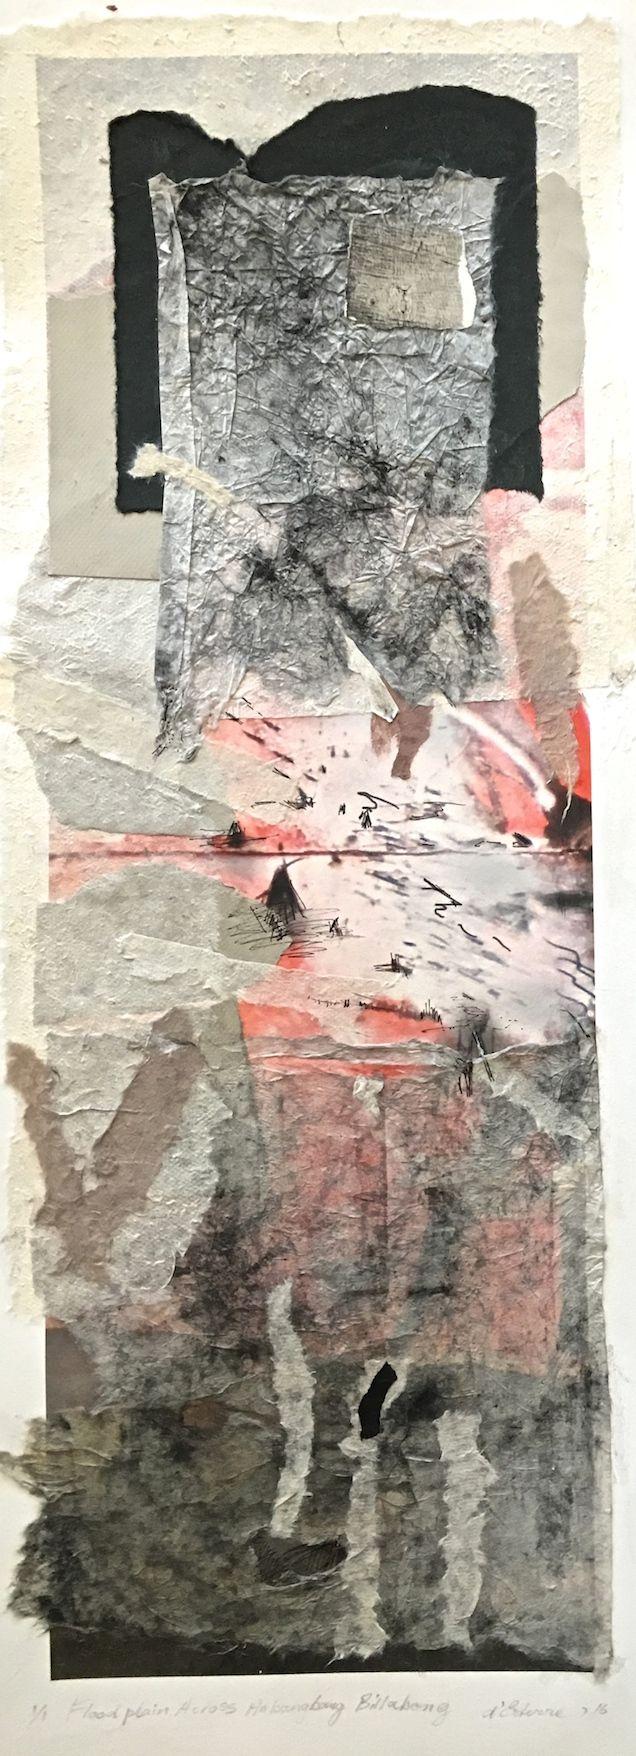 Elaine d'Esterre - Flood Plain Across Anbangbang Billabong, 2017, digital print and collage, 75x25 cm. Also ART BLOG at http://elainedesterreart.com/ and http://www.facebook.com/desterreart/ and http://instagram.com/desterreart/